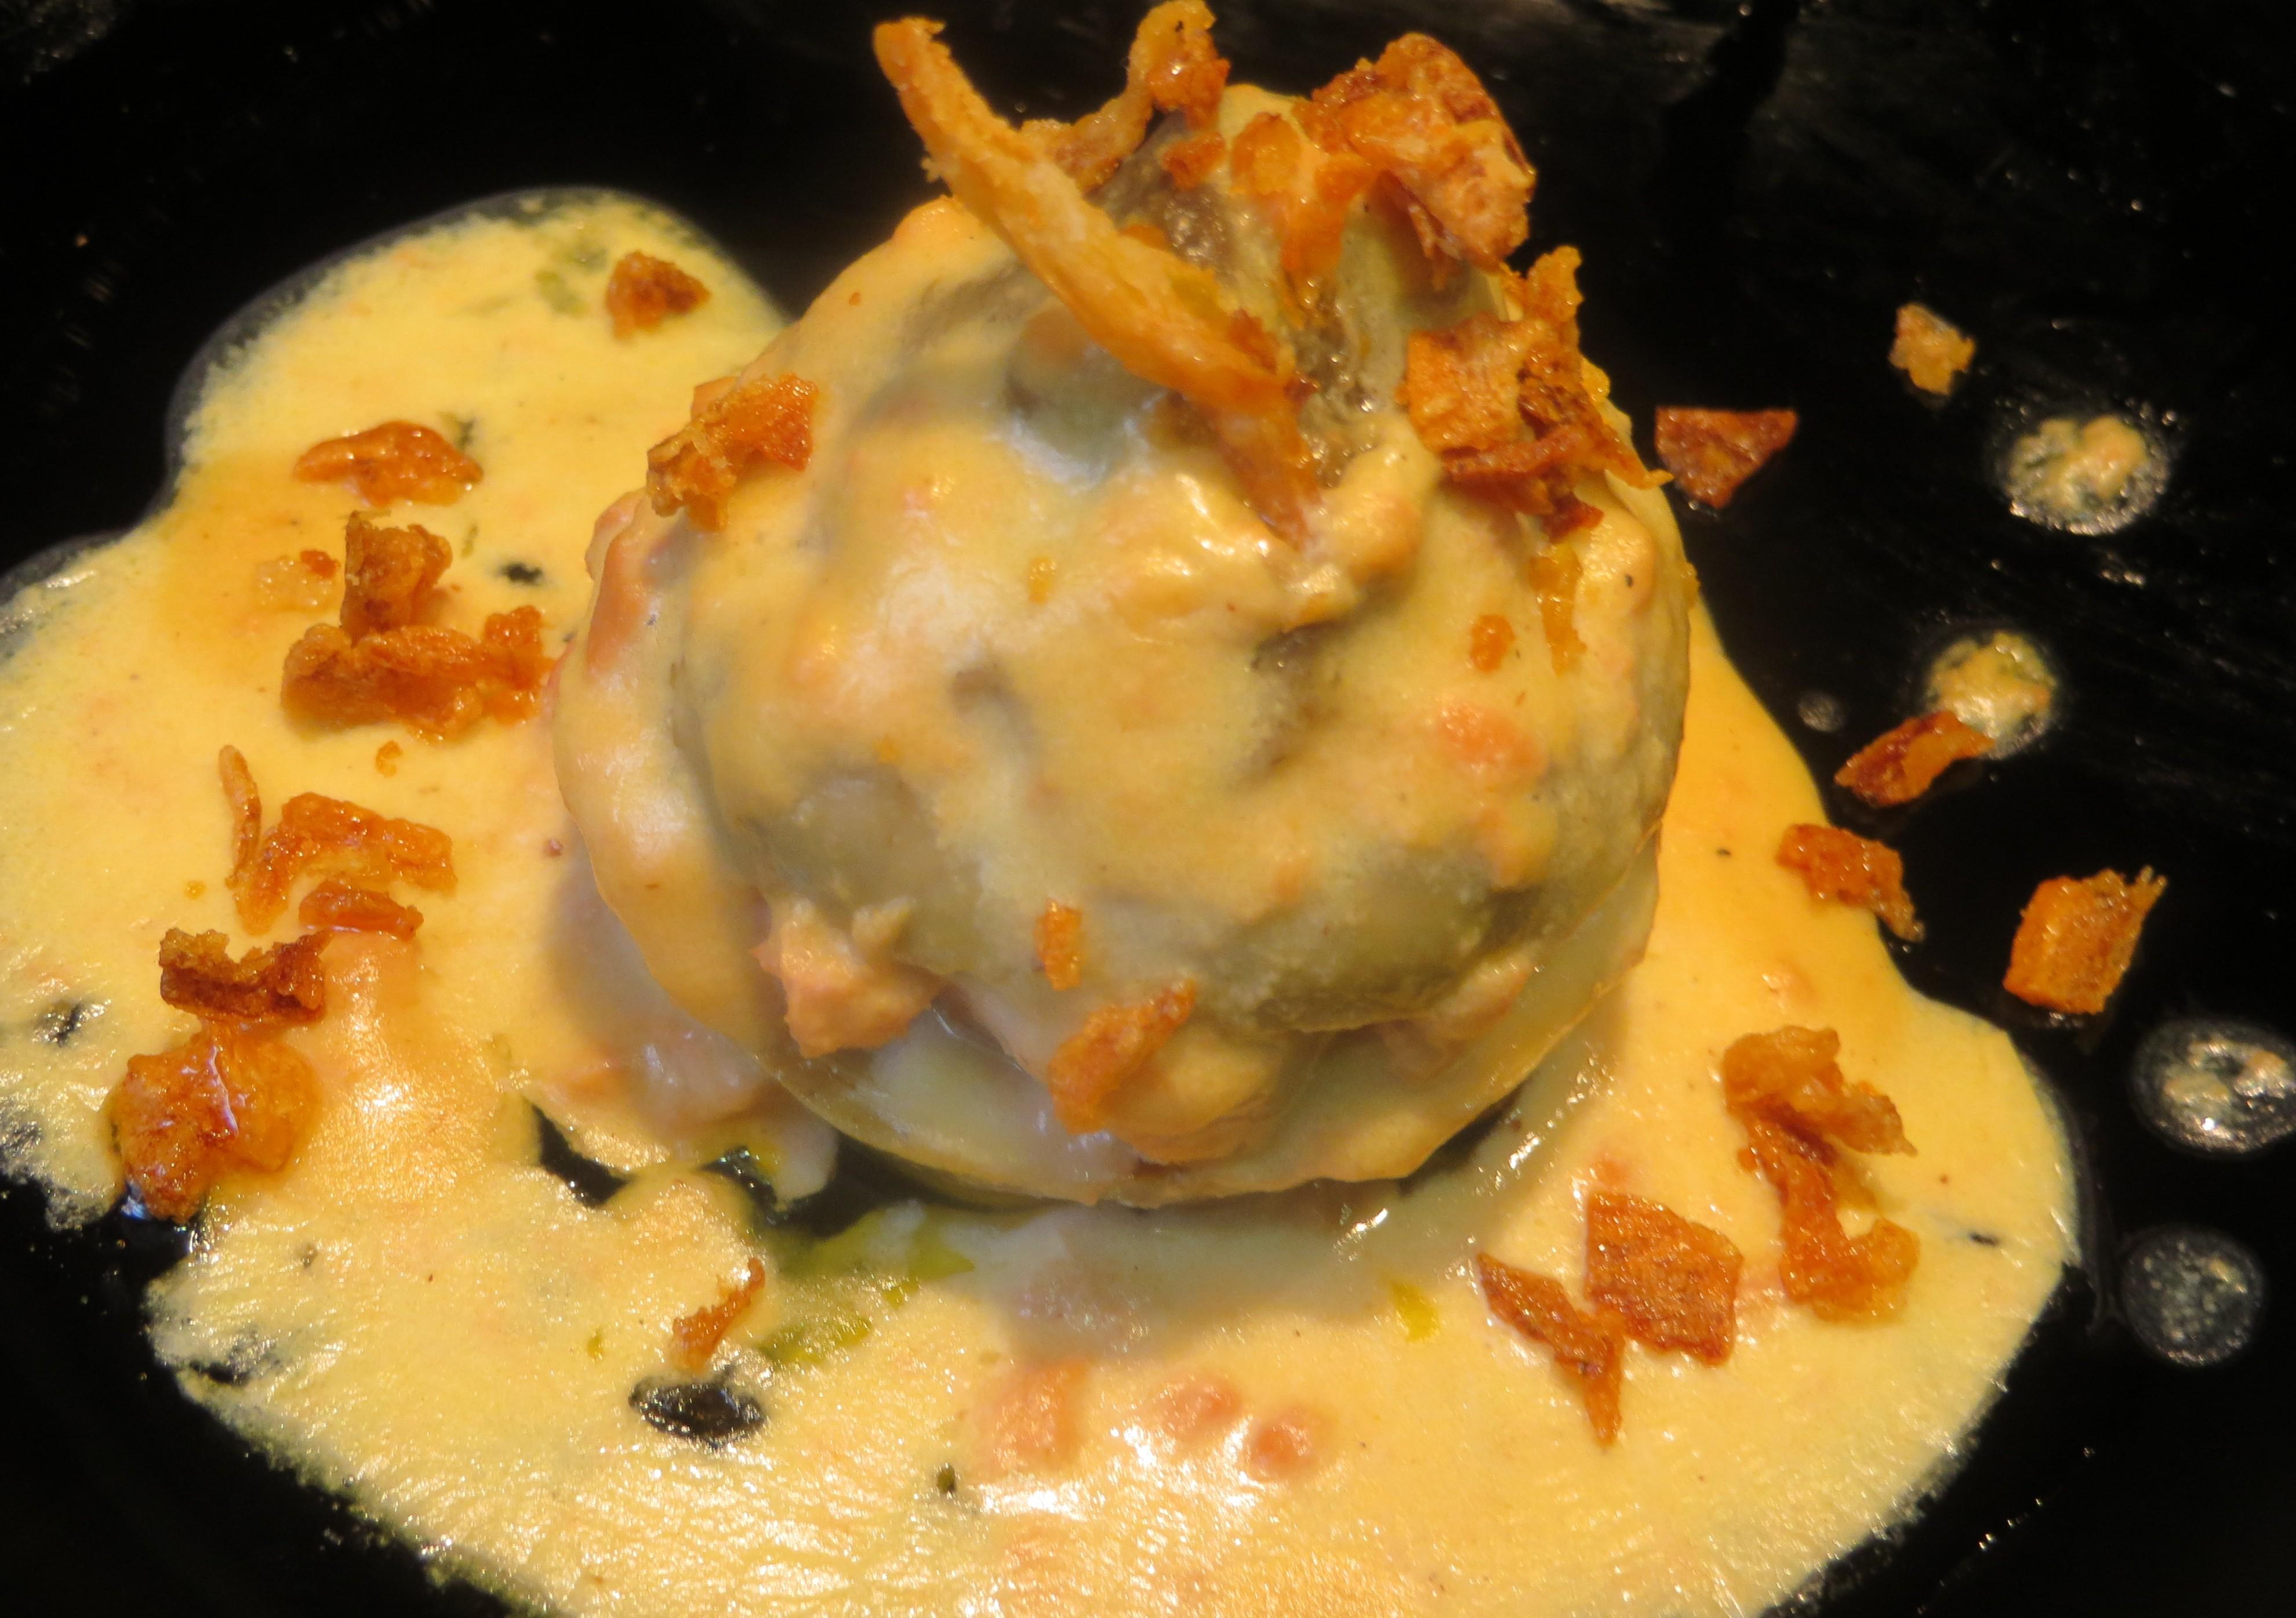 alcachofa confitada rellena de foie mi-cuit